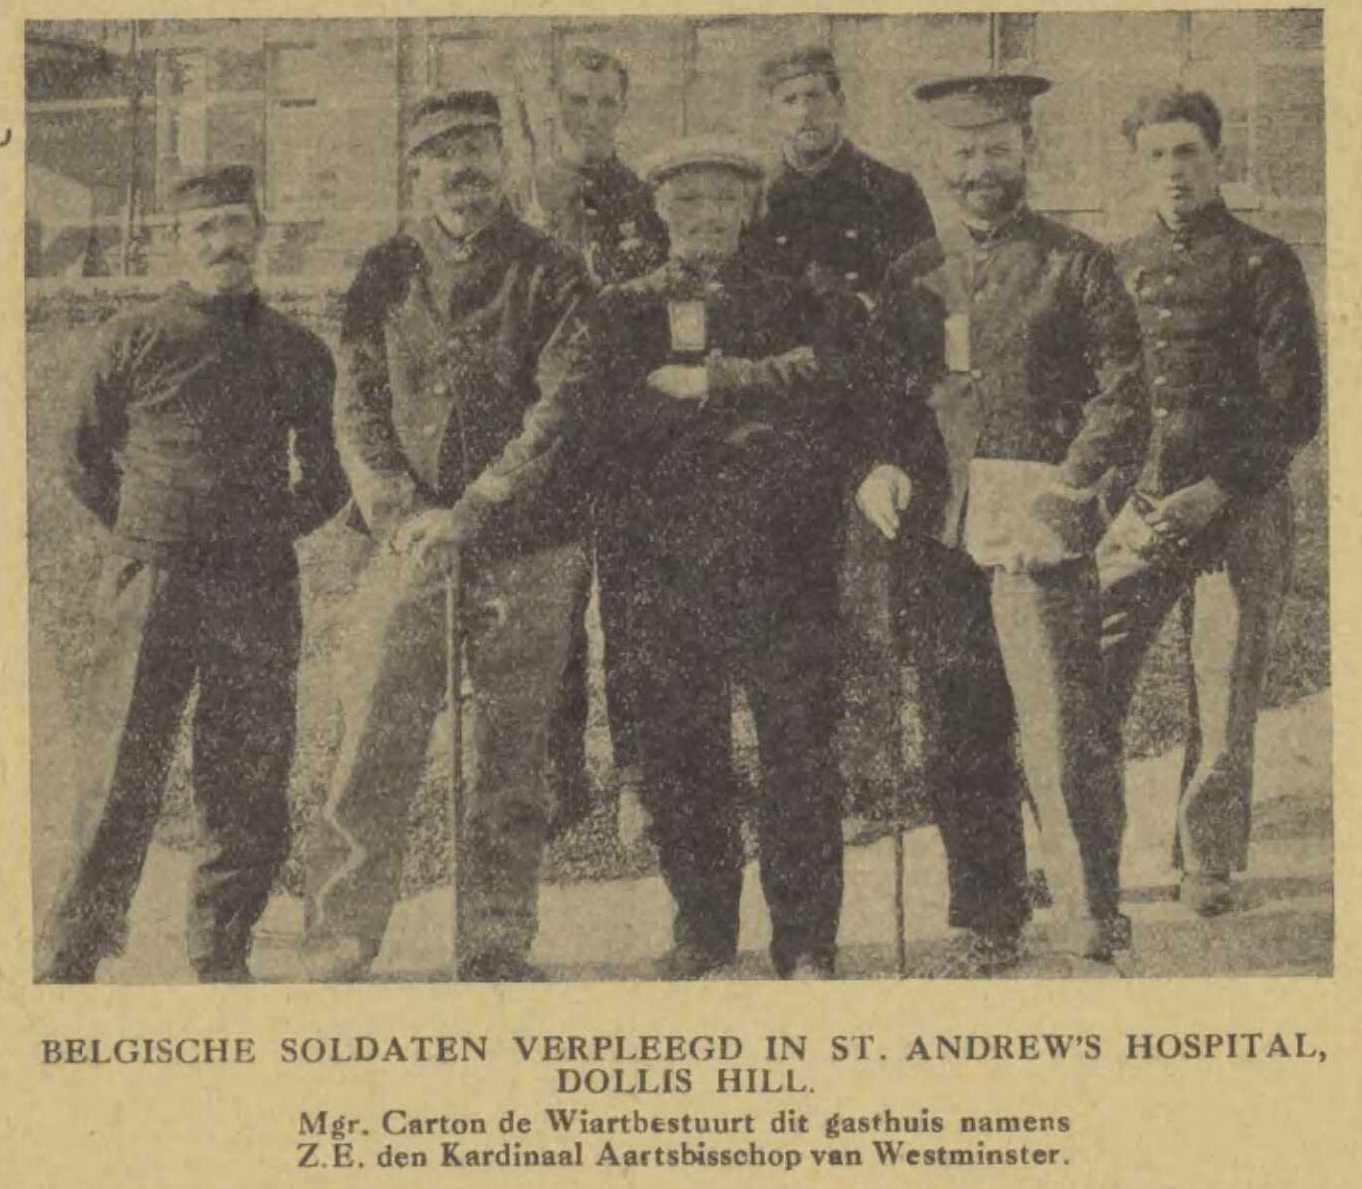 De Stem uit België, 13 november 1914